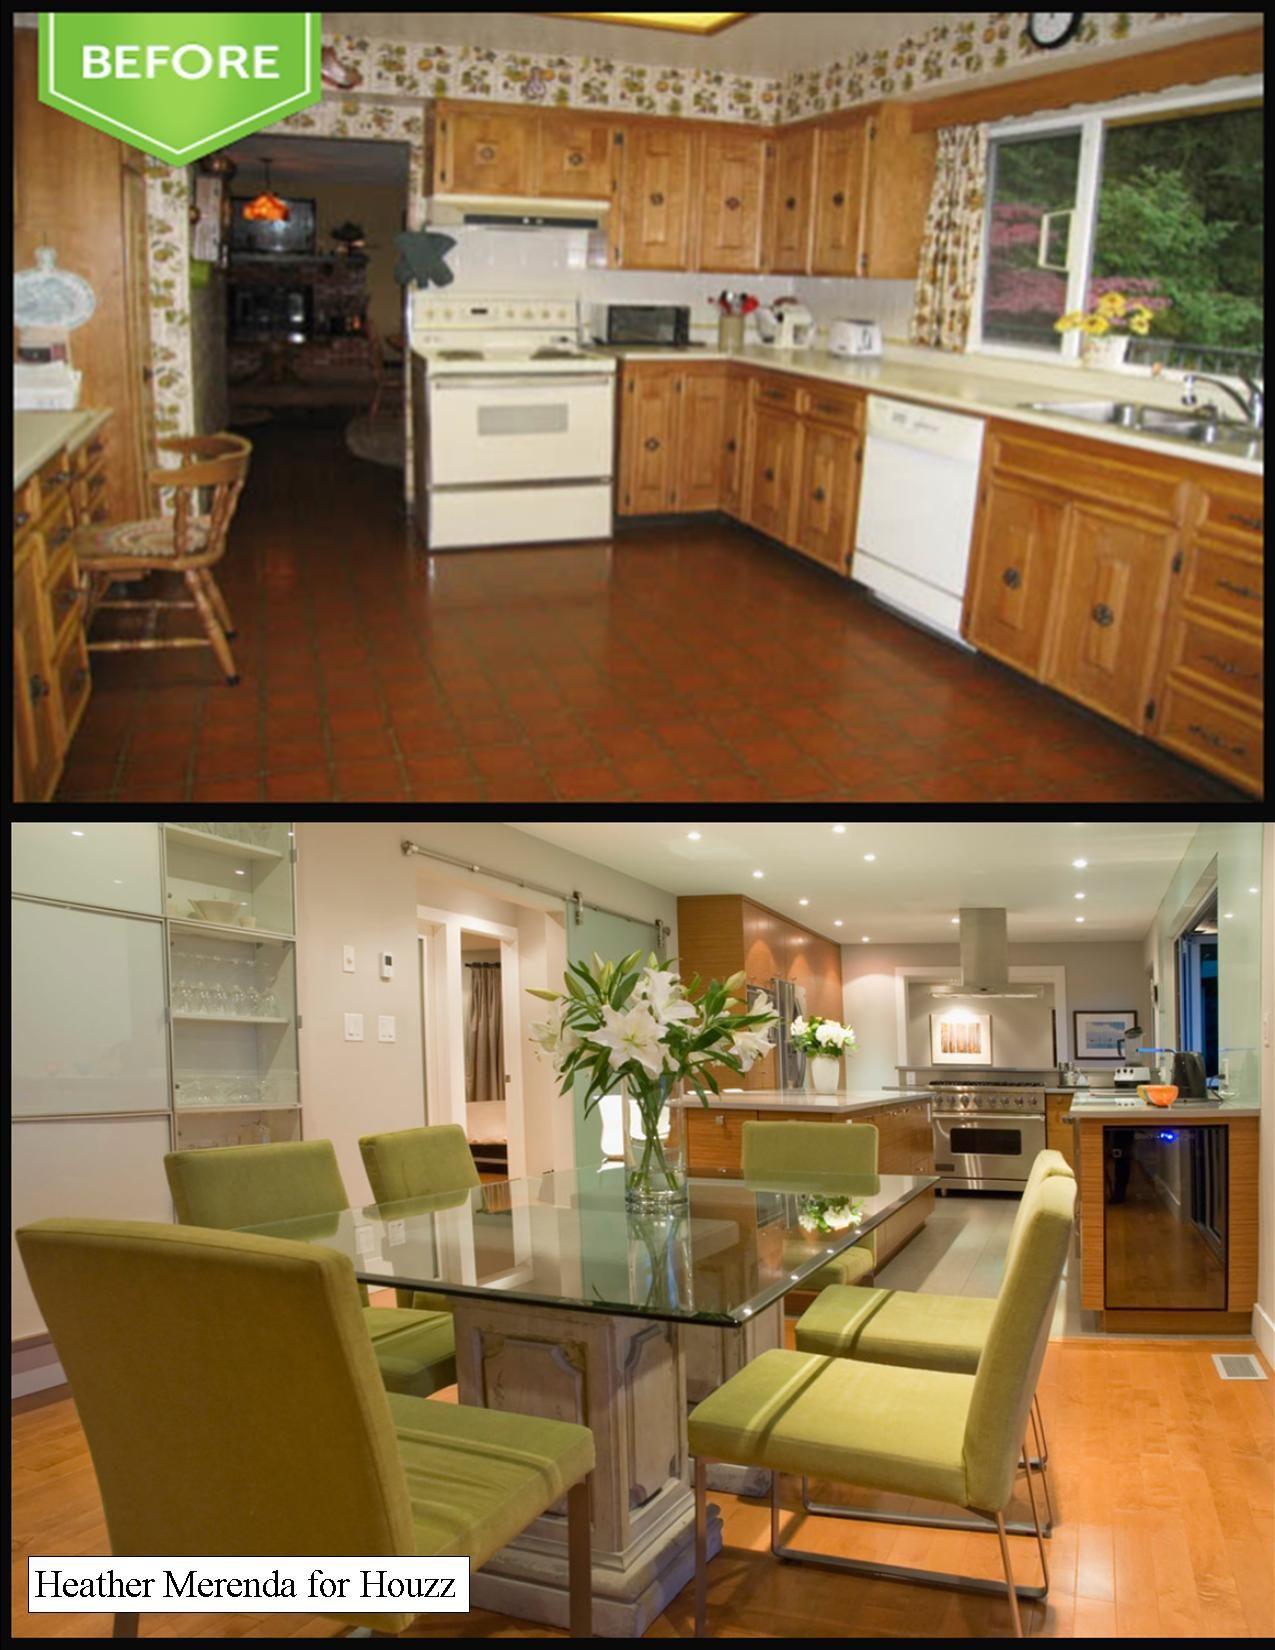 houzz recessed lighting. Brilliant Remodel Of A Vancouver 50\u0027s Home ~ Sandblasted Glass Barn Door, Recessed Lighting, Houzz Lighting I